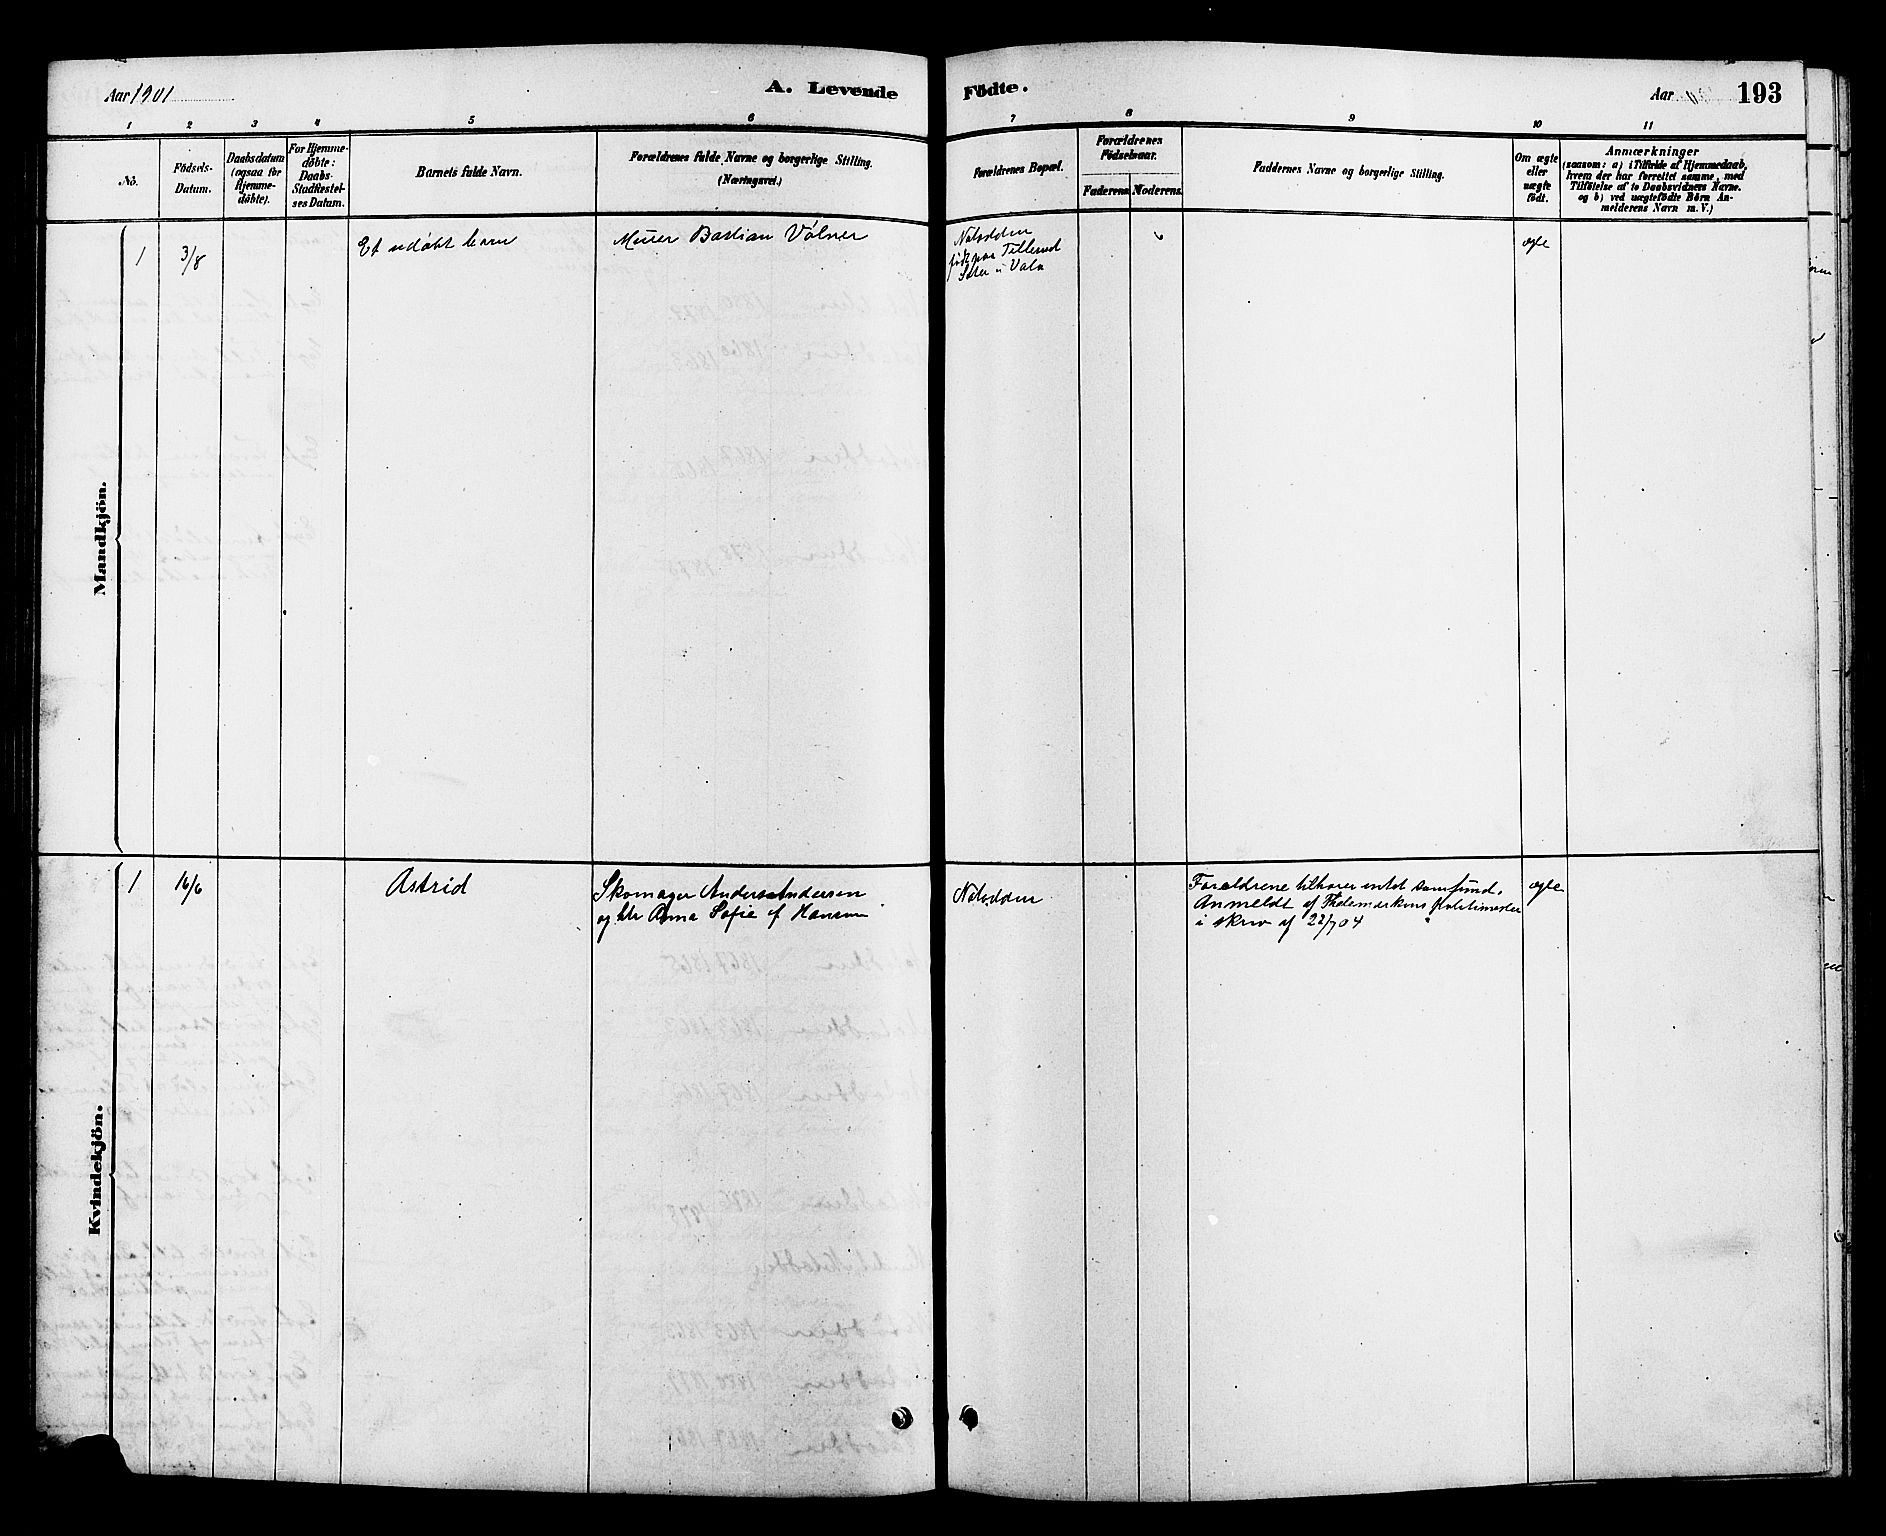 SAKO, Heddal kirkebøker, G/Ga/L0002: Klokkerbok nr. I 2, 1879-1908, s. 193